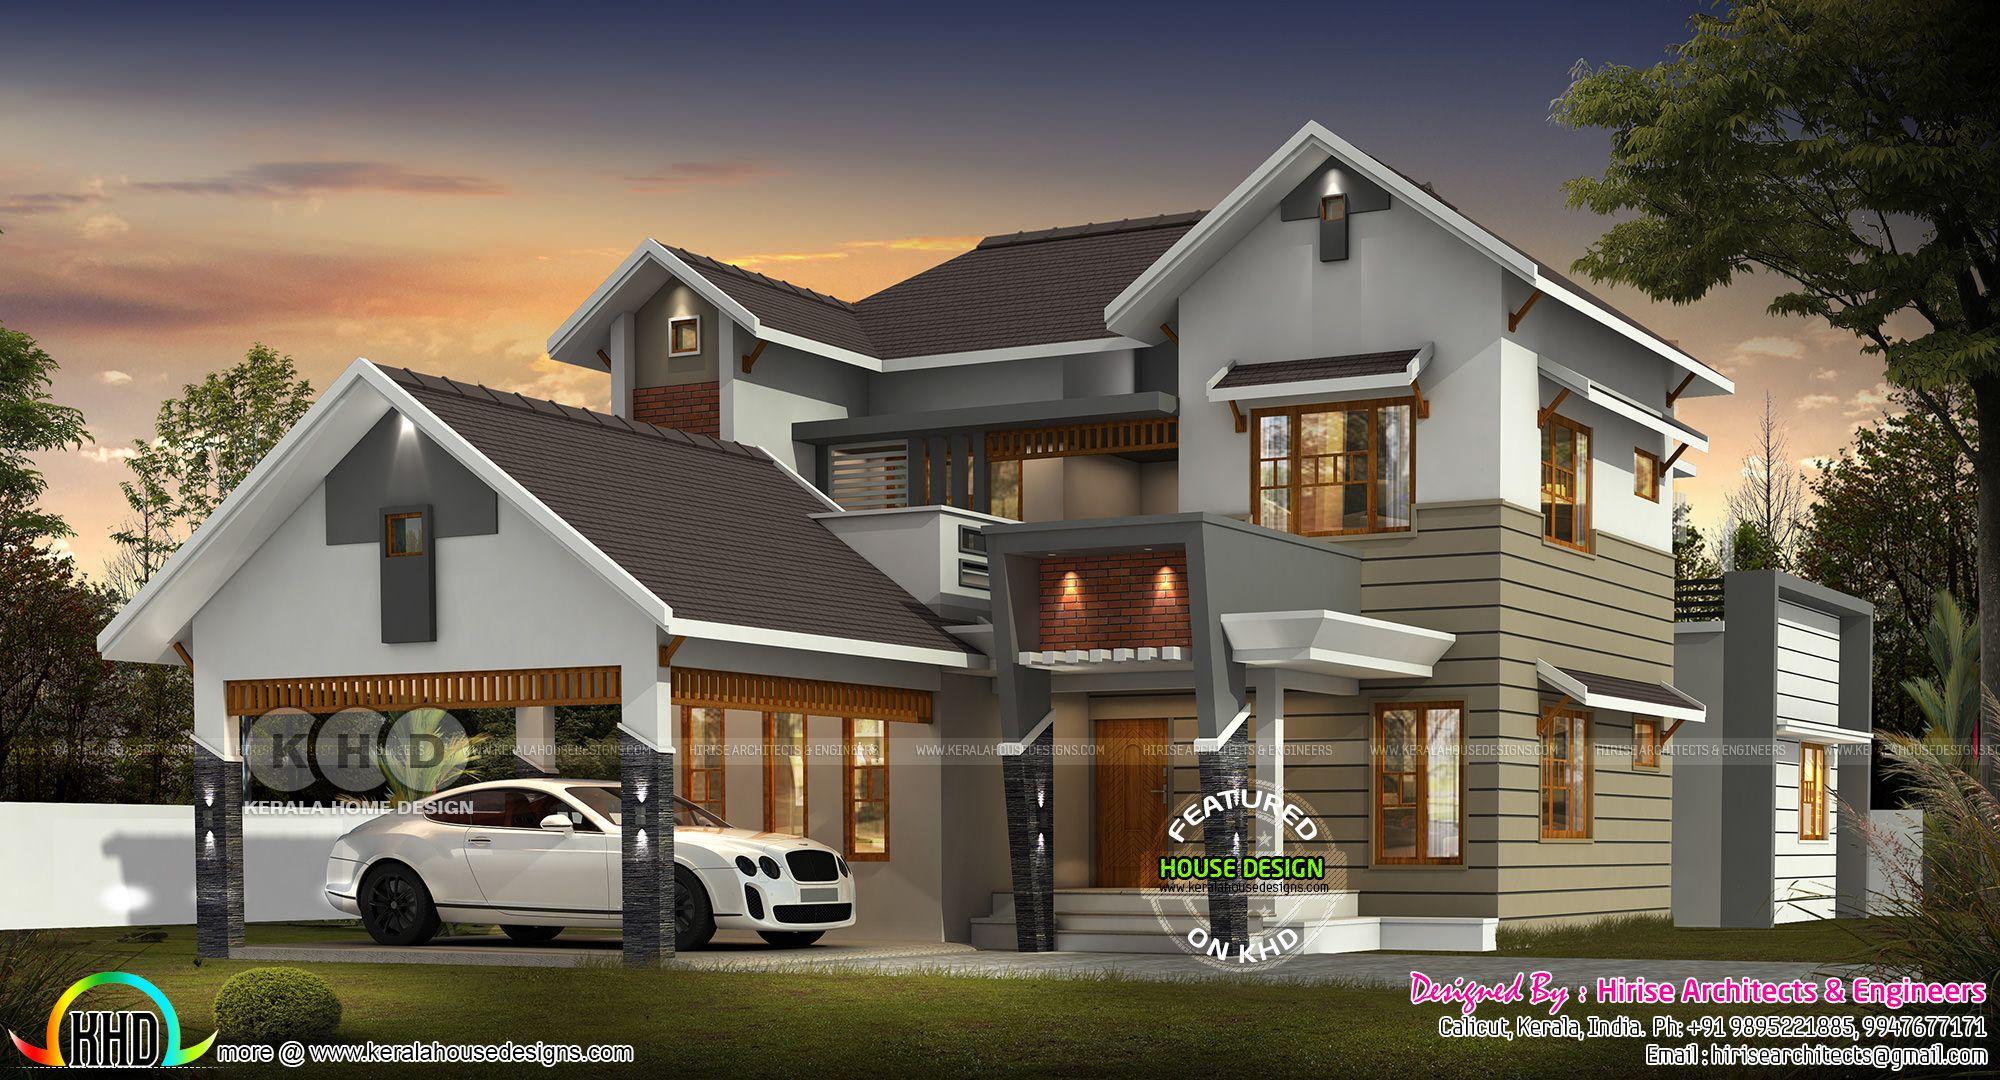 a1e1b0a7b9f2ea94f289ed89fb85b4d2 - 15+ Modern Small House Design 2020 Gif